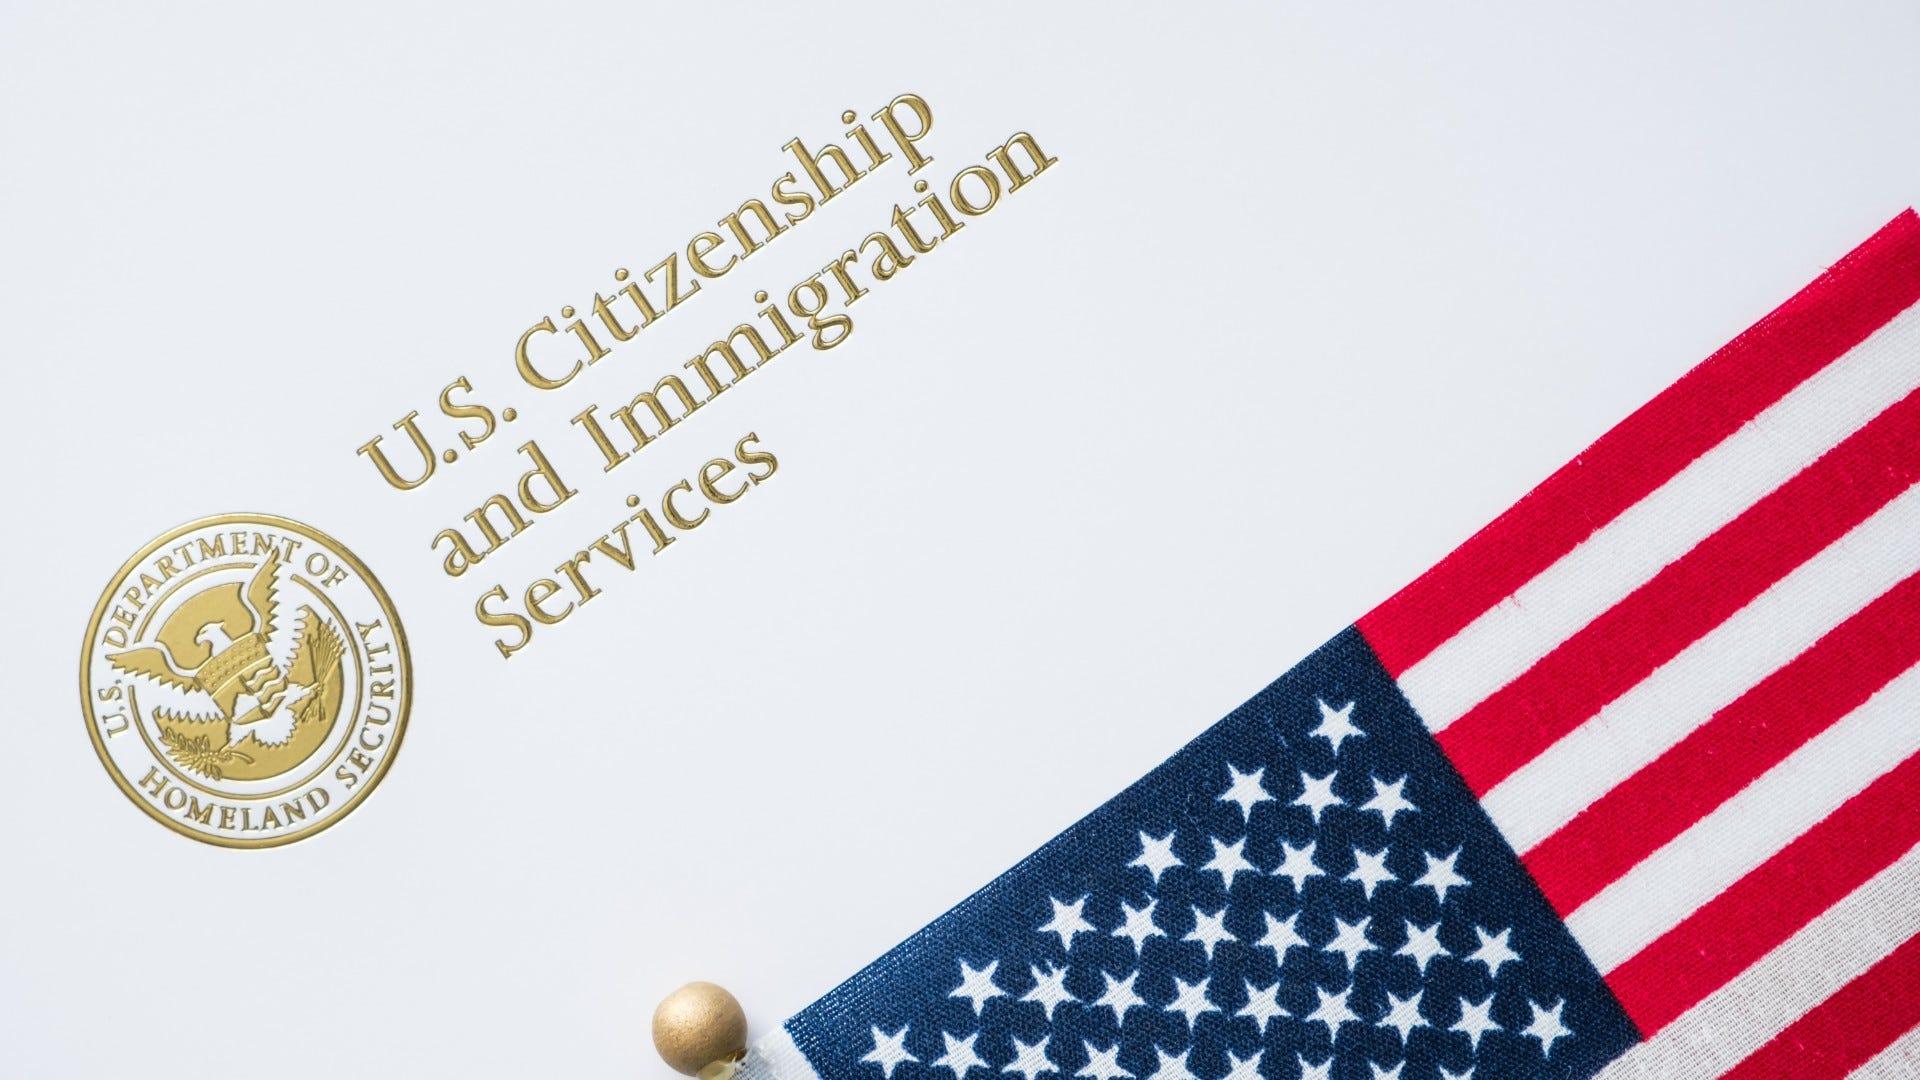 Firma de abogados de inmigración - Abogados de inmigración en Houston